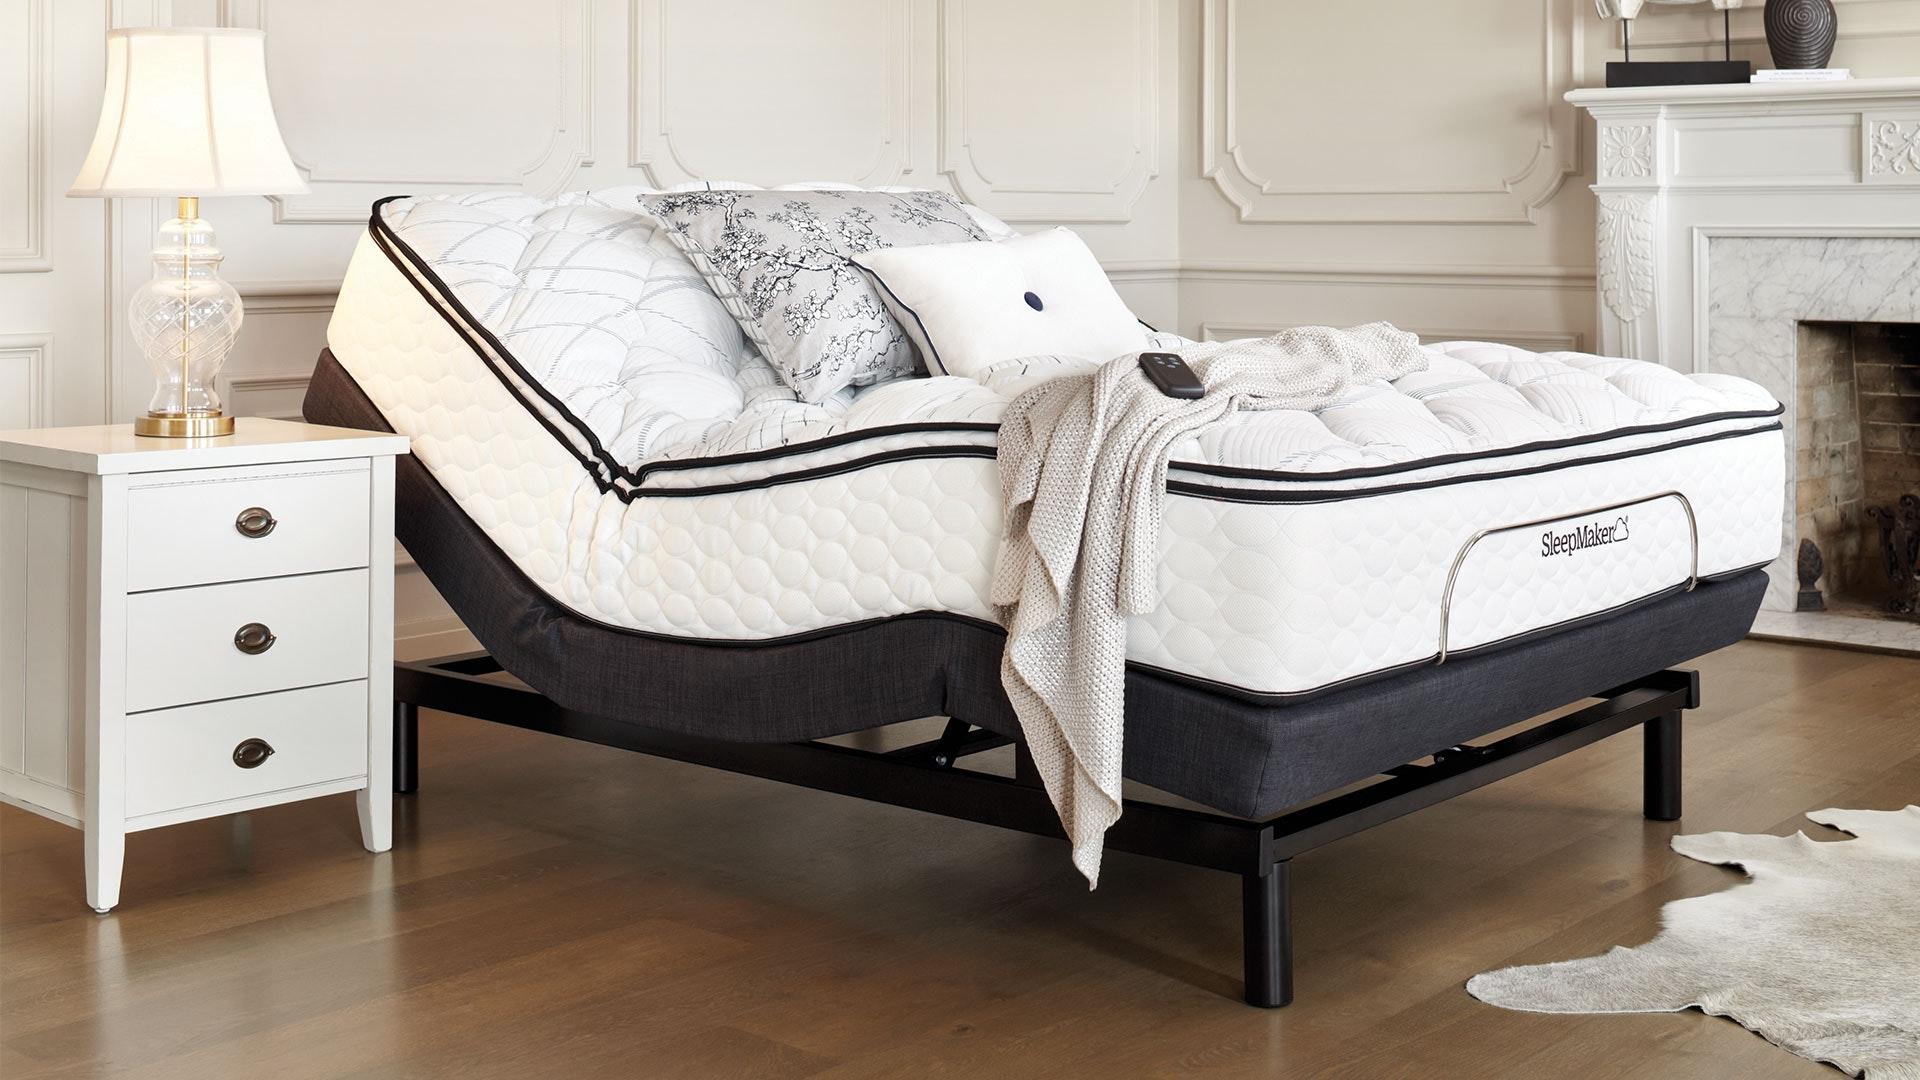 Sleepmaker Posture Align Medium King Single Mattress with Lifestyle Adjustable Base by Tempur